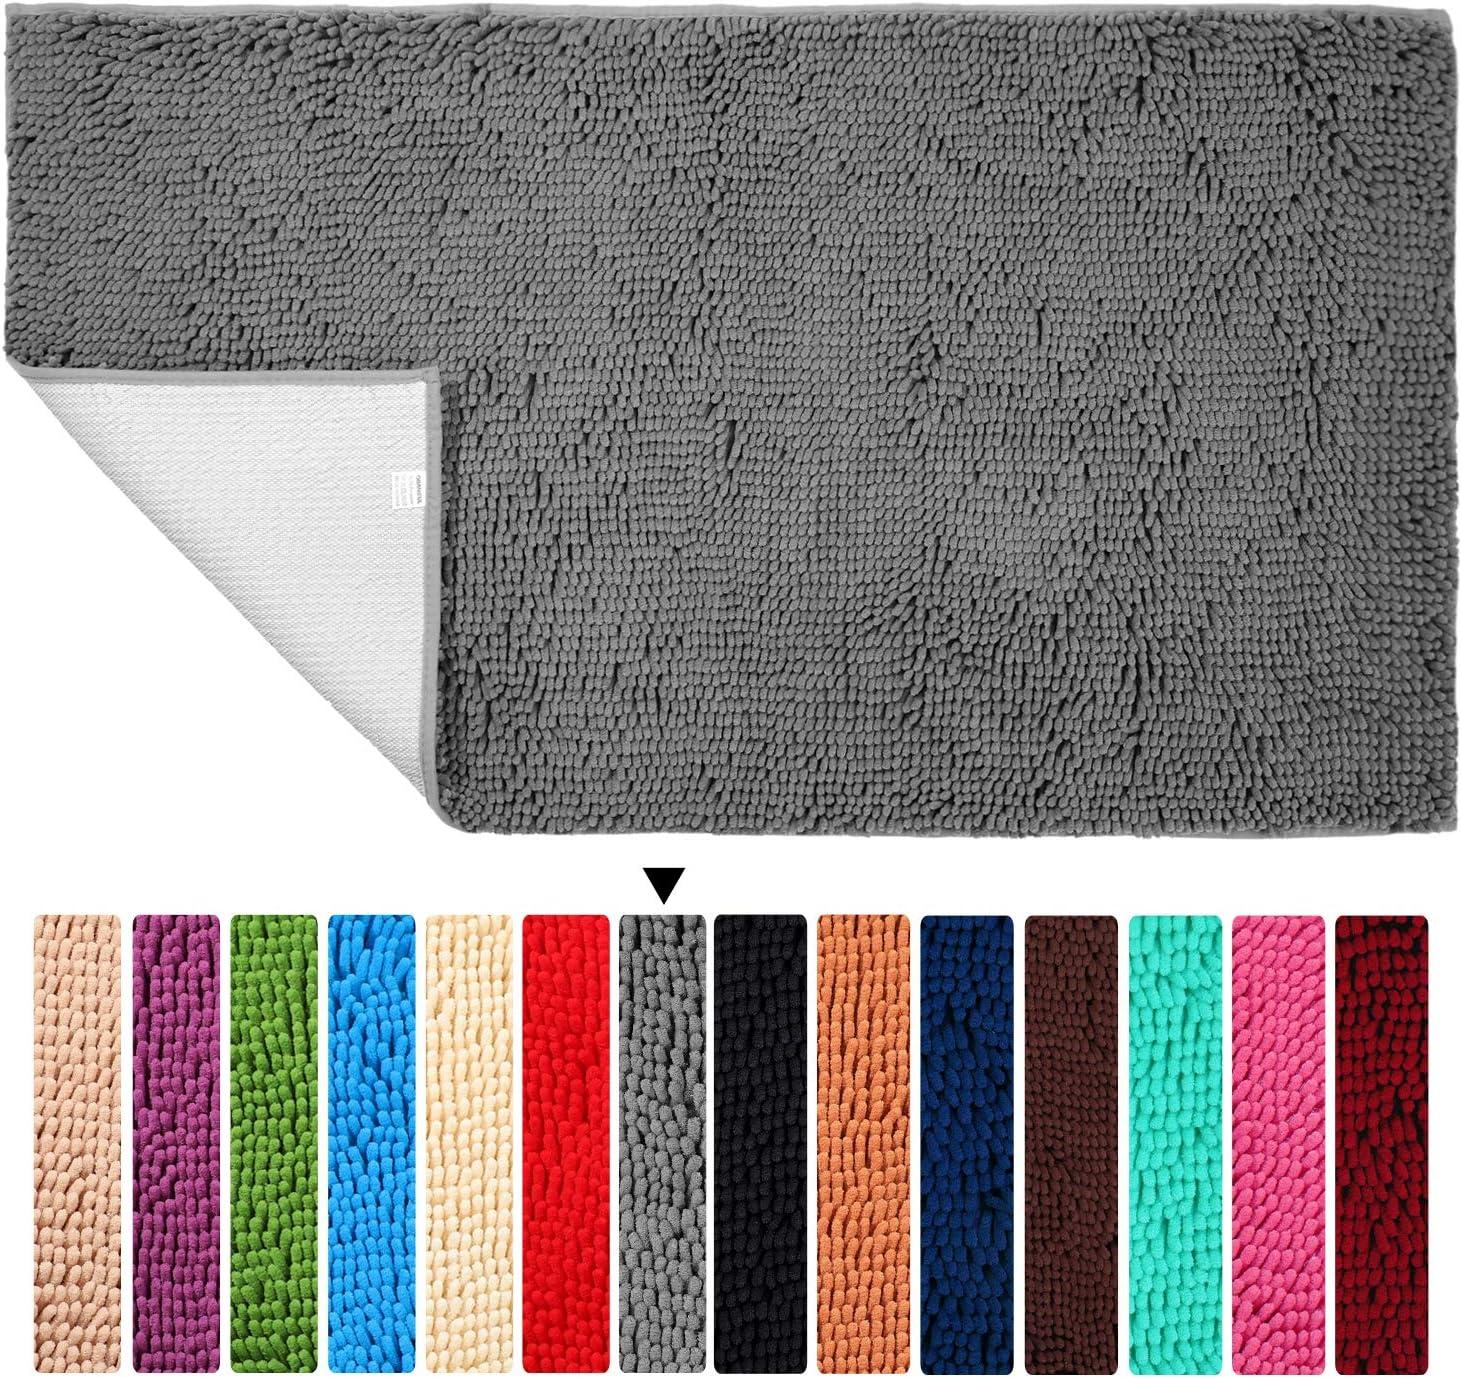 "Gray Bath Mat Runner 27.5""x 47"" Non Slip Rugs for Bathroom Floor ORANIFUL Microfiber Plush Kitchen Mat Super Water Absorbent Machine Wash/Dry Shaggy Toilet Carpet Extra Soft"